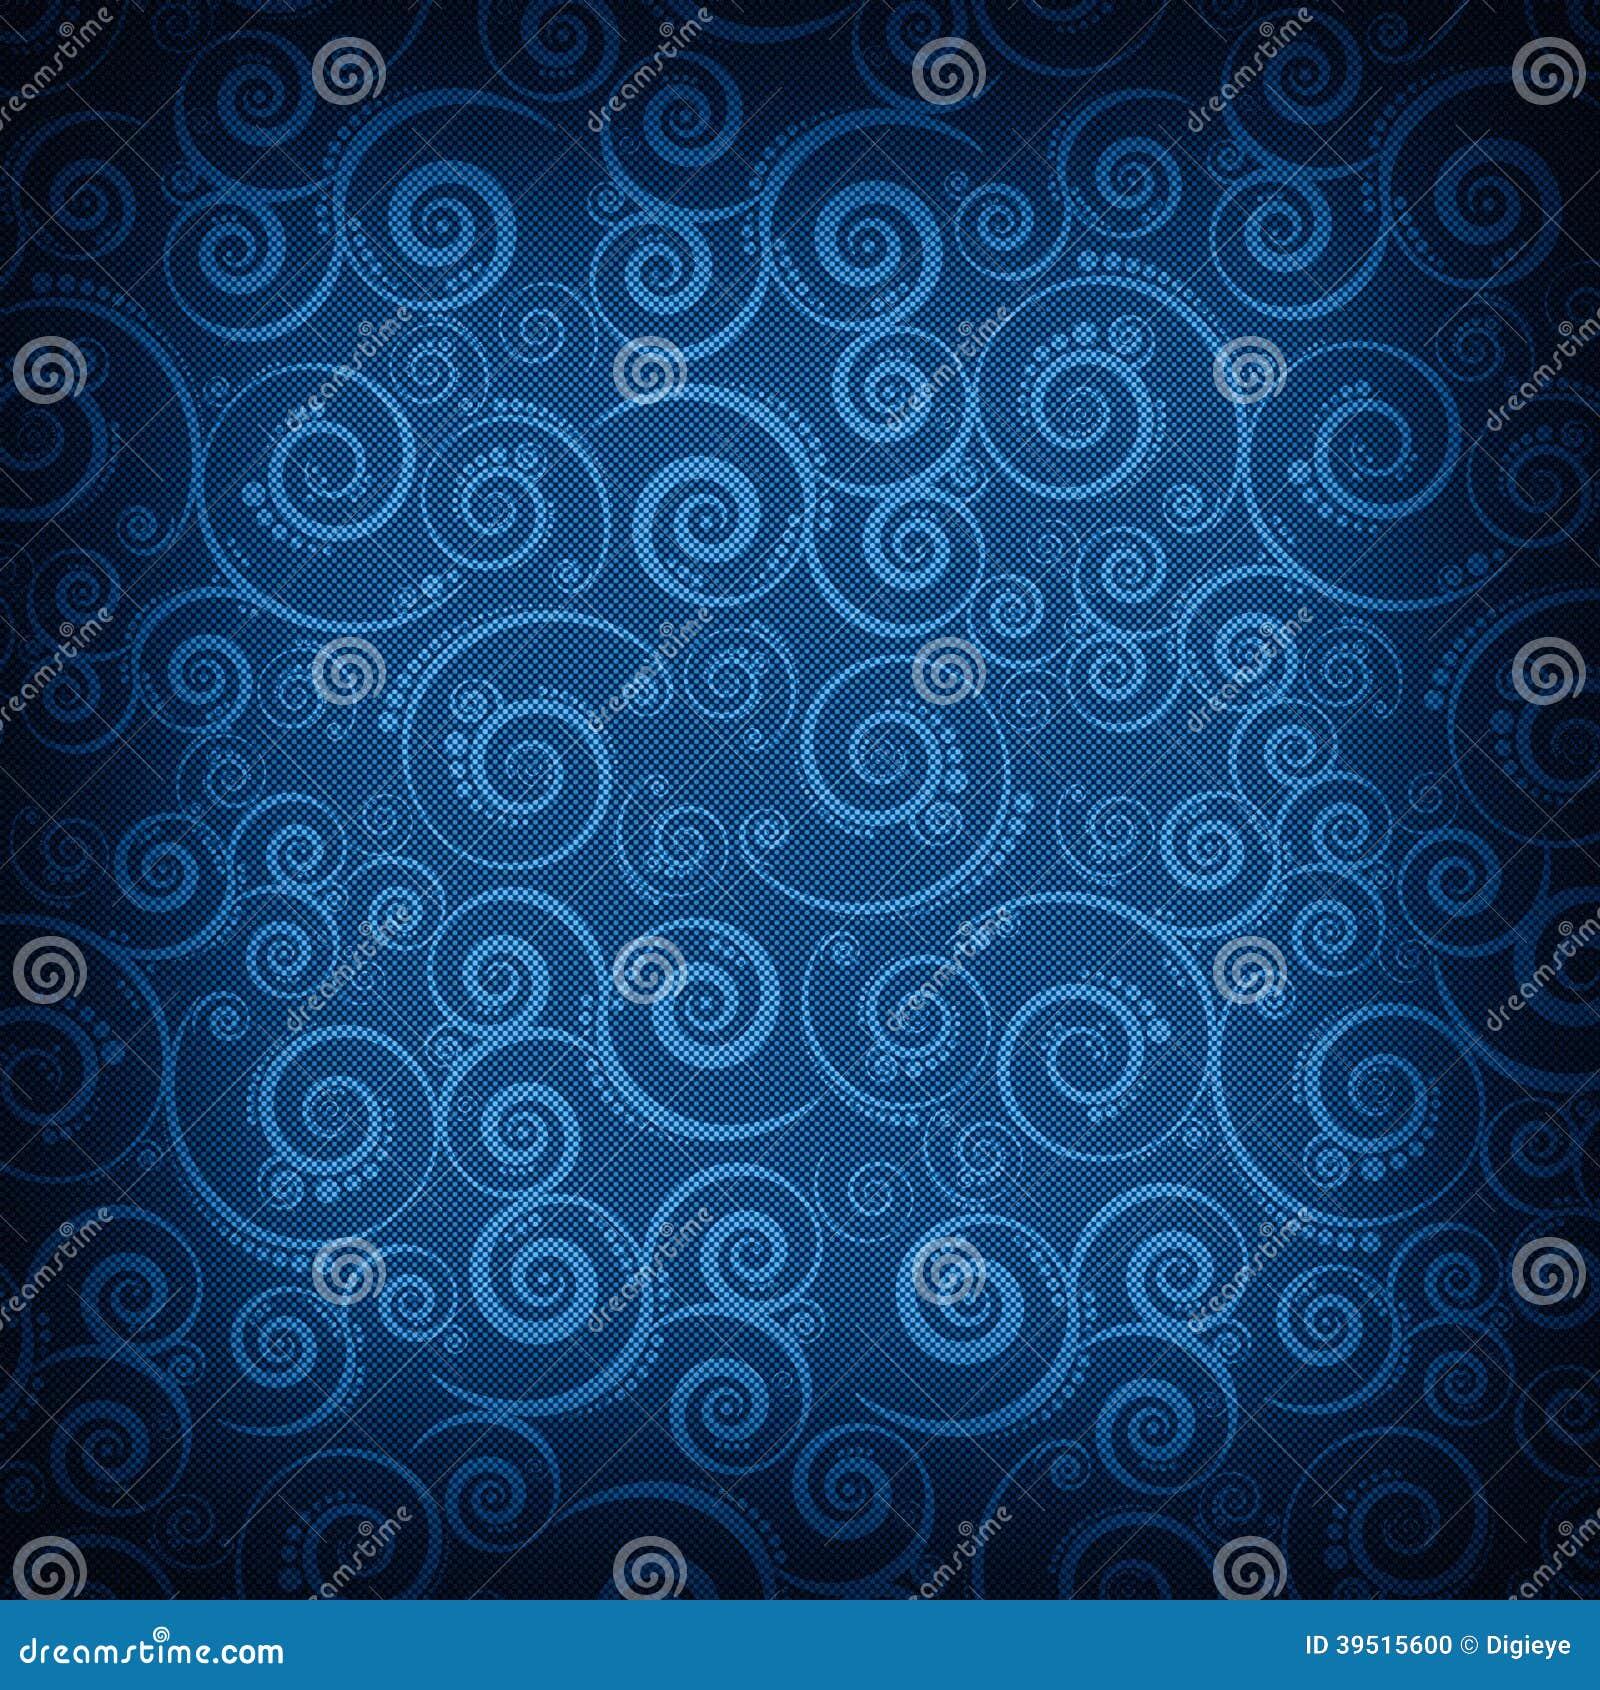 Blue patterned background